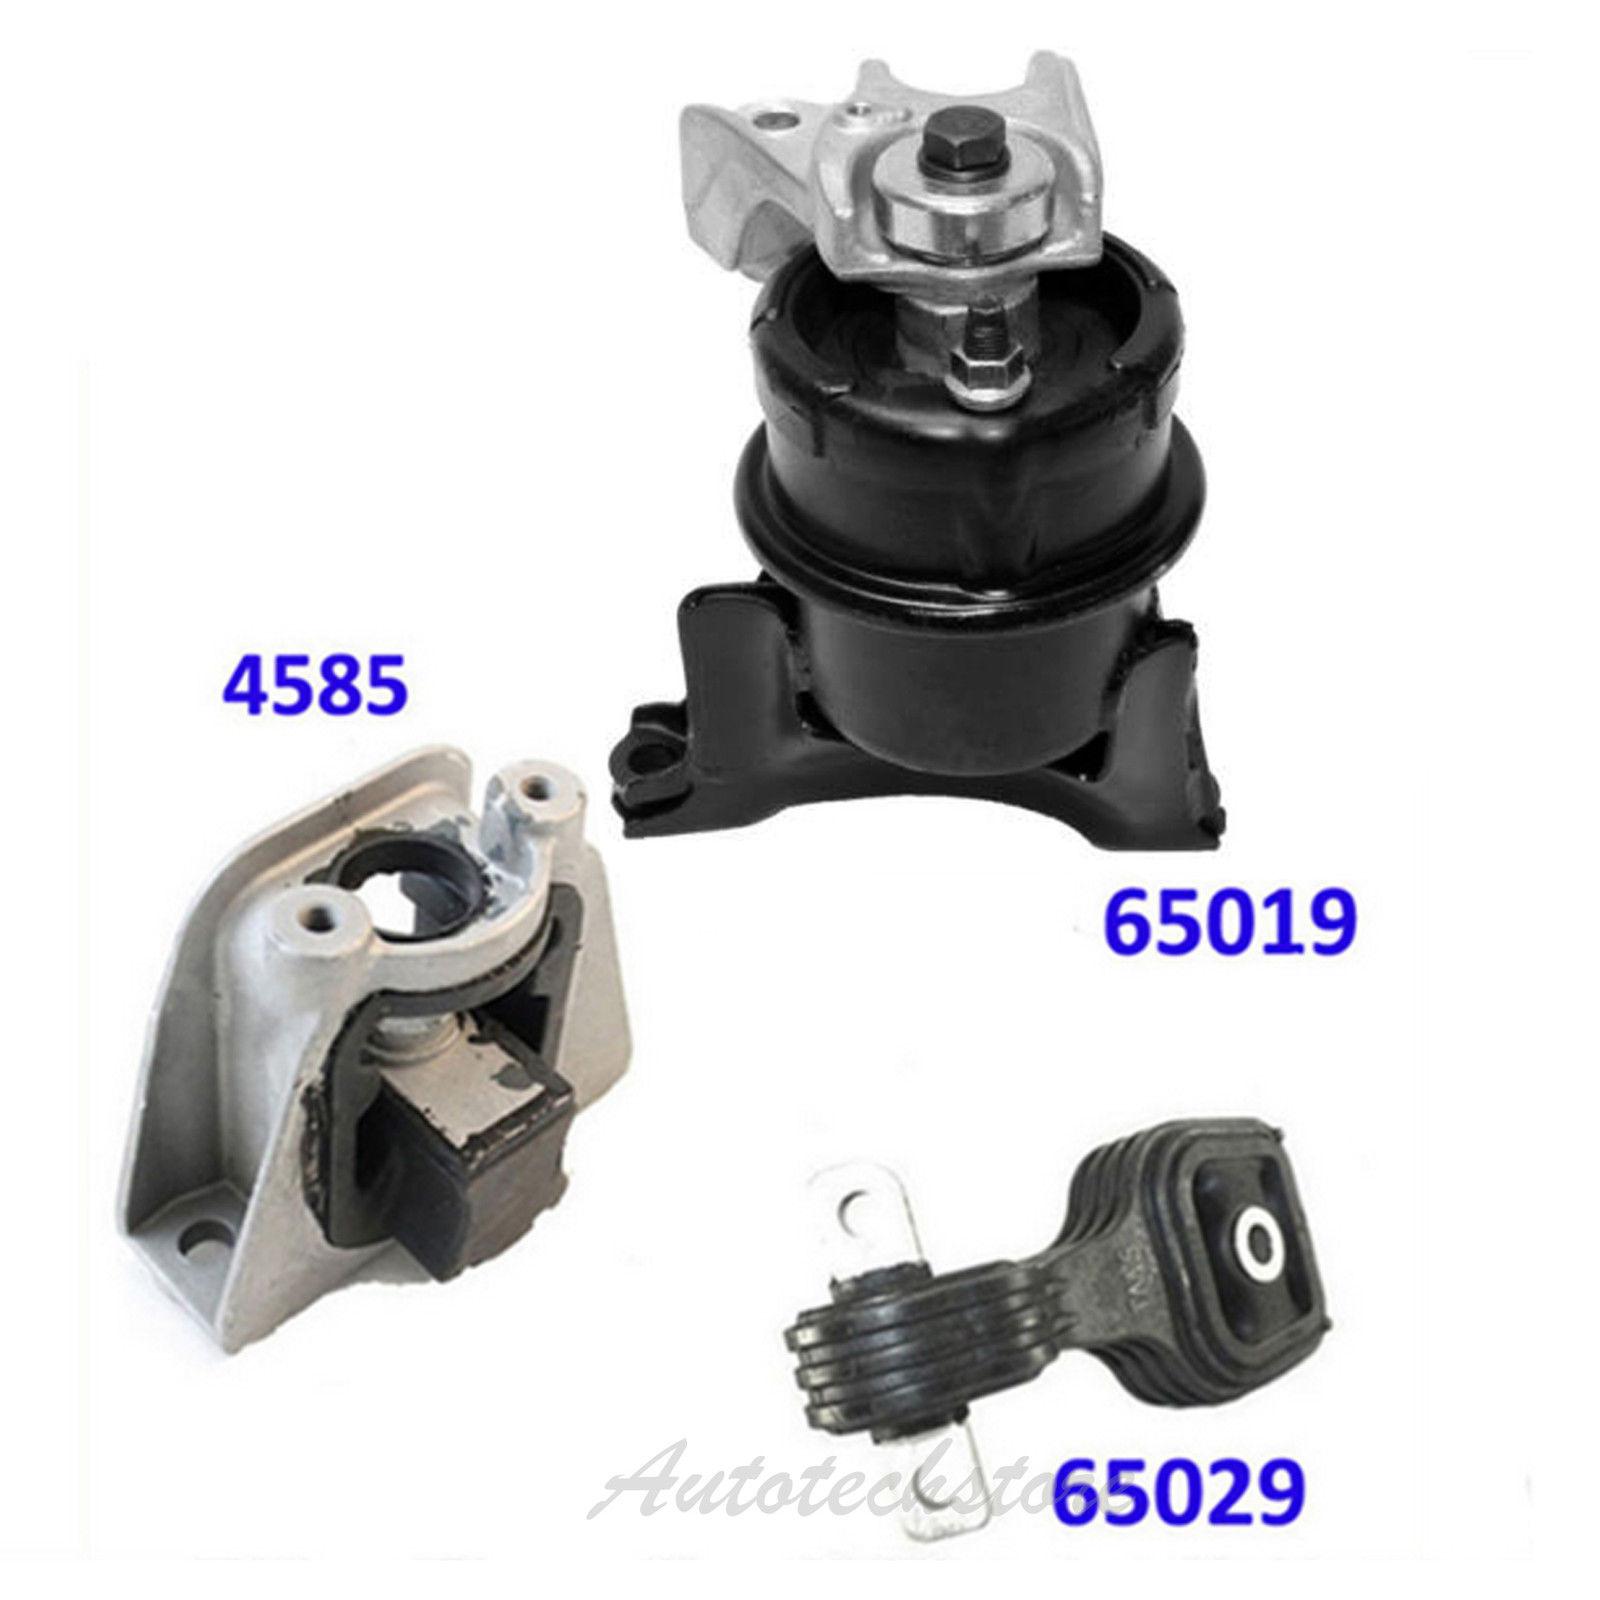 A65019 Front Engine Motor Mount For 06-11 Honda Civic 1.3L Hybrid 50820SNC043